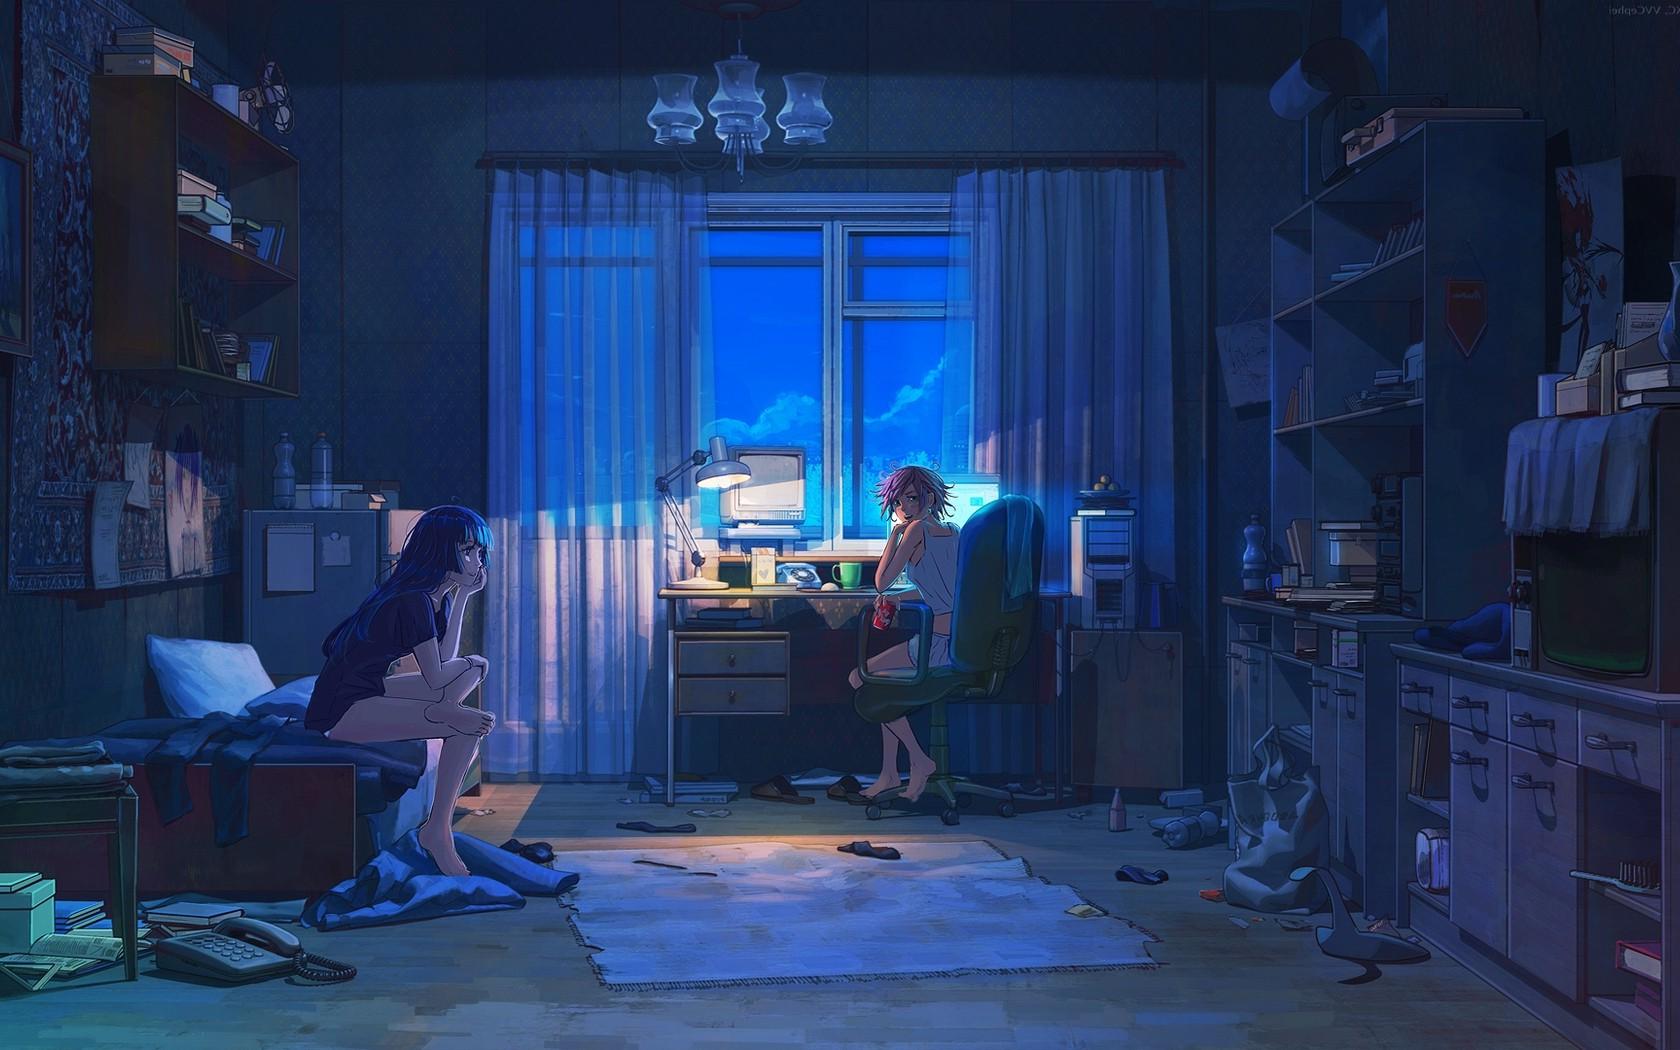 anime room wallpaper,blue,scene,room,stage,adventure game